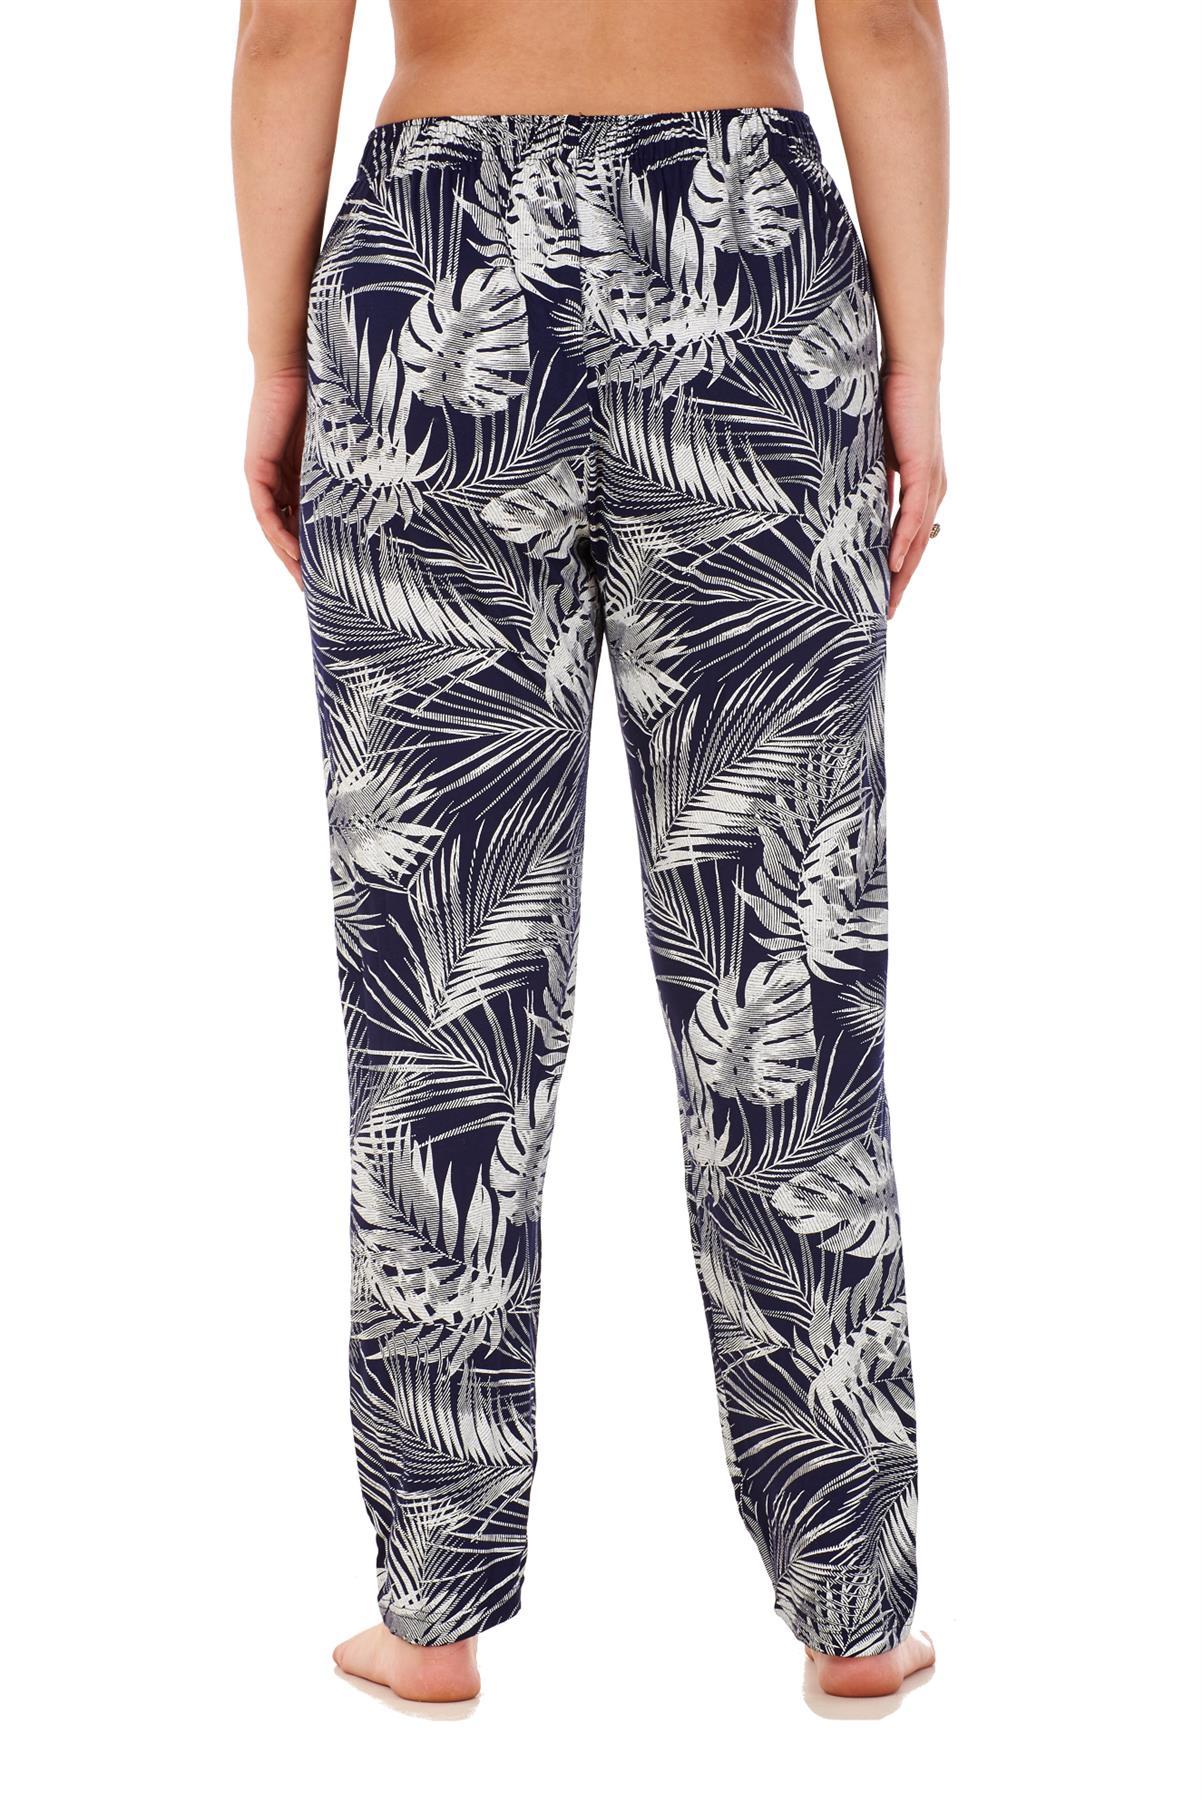 Ladies-Women-Trouser-Elasticated-Printed-Tapered-Harem-High-waist-Regular-Pants thumbnail 28